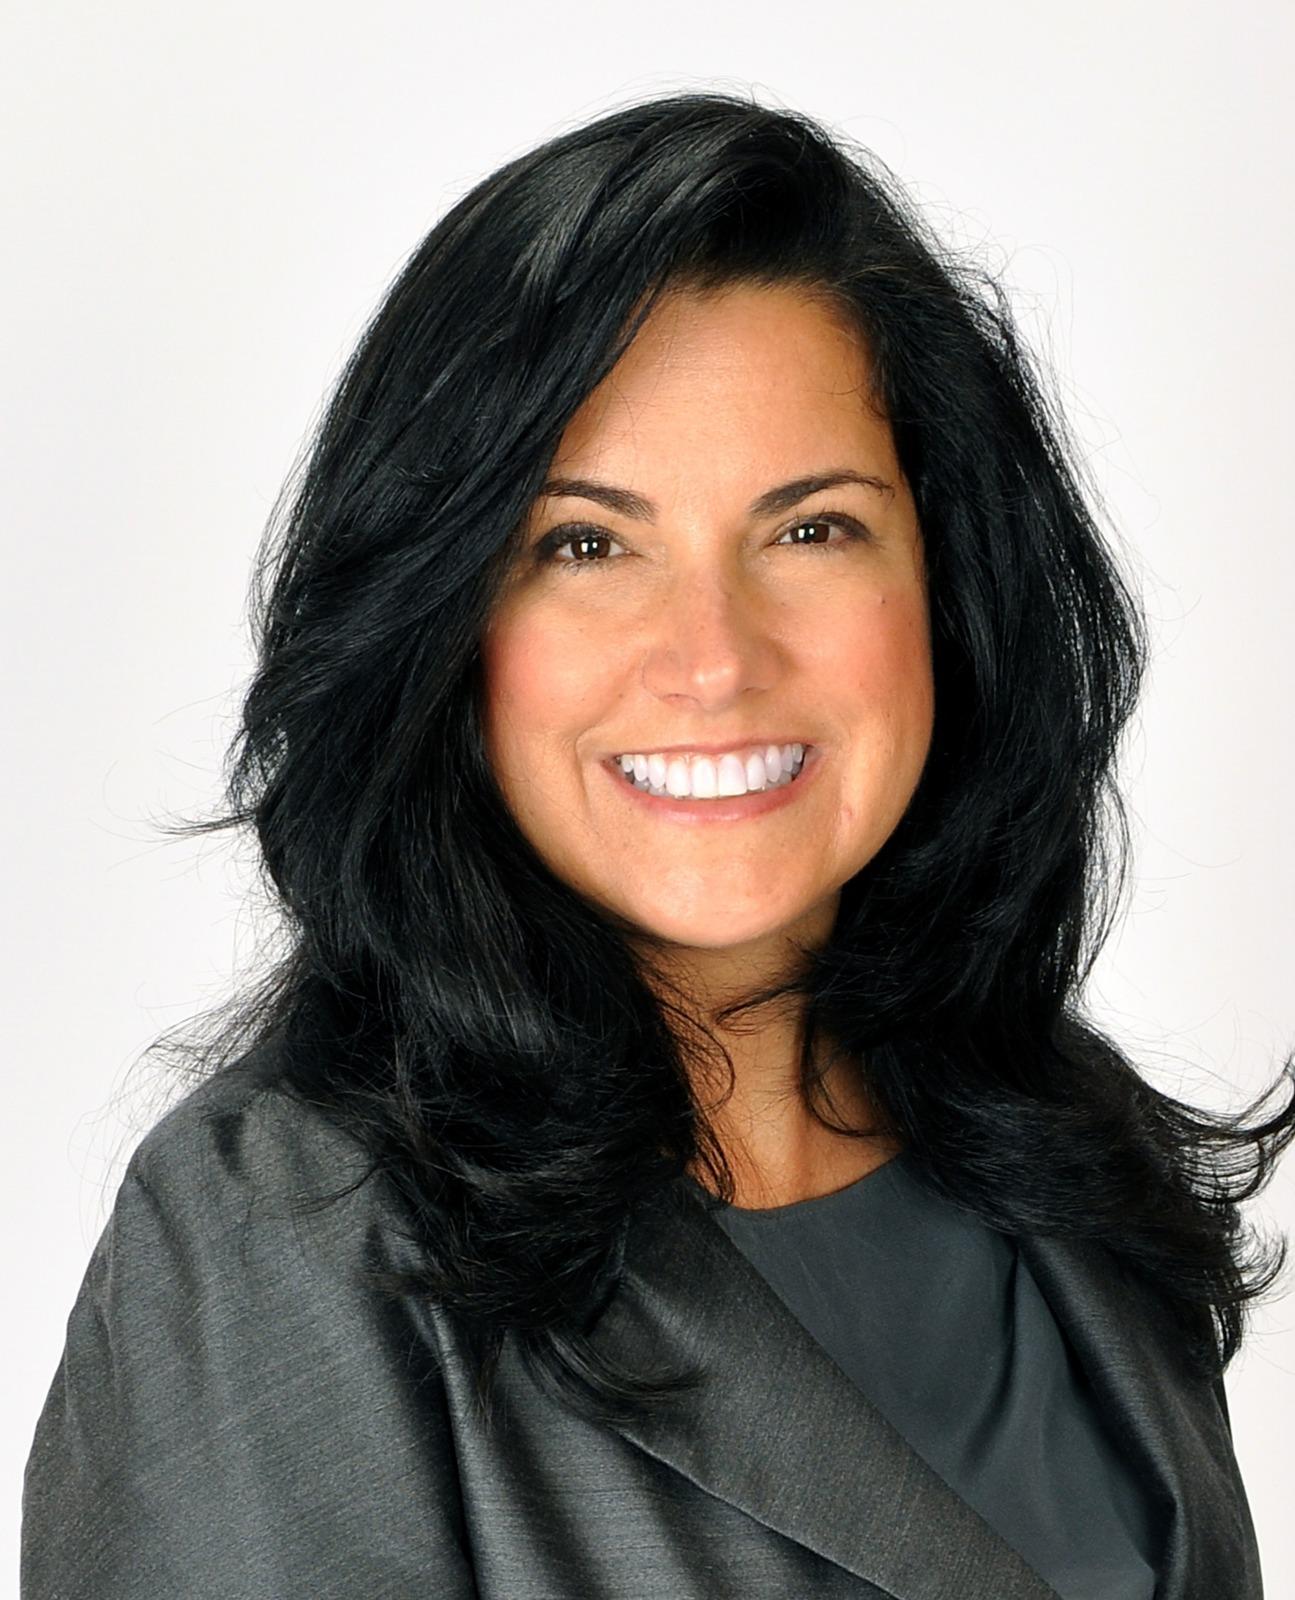 Christine Carona | Boston, MA | Morgan Stanley Wealth Management